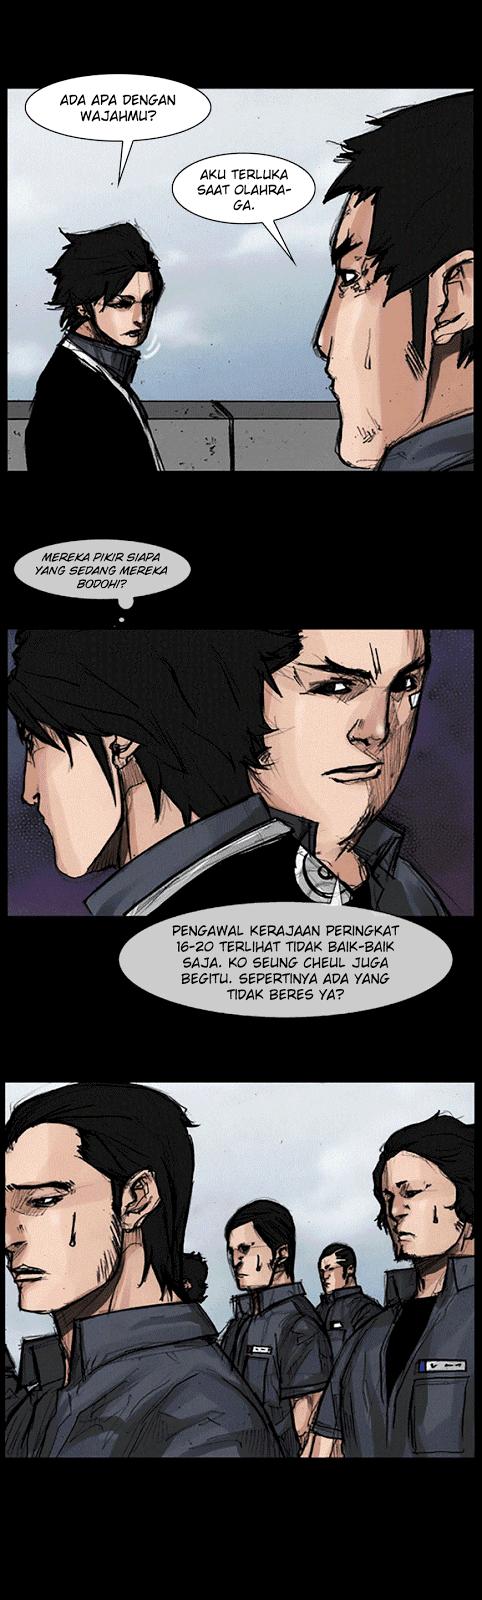 Komik dokgo 041 - chapter 41 42 Indonesia dokgo 041 - chapter 41 Terbaru 10|Baca Manga Komik Indonesia